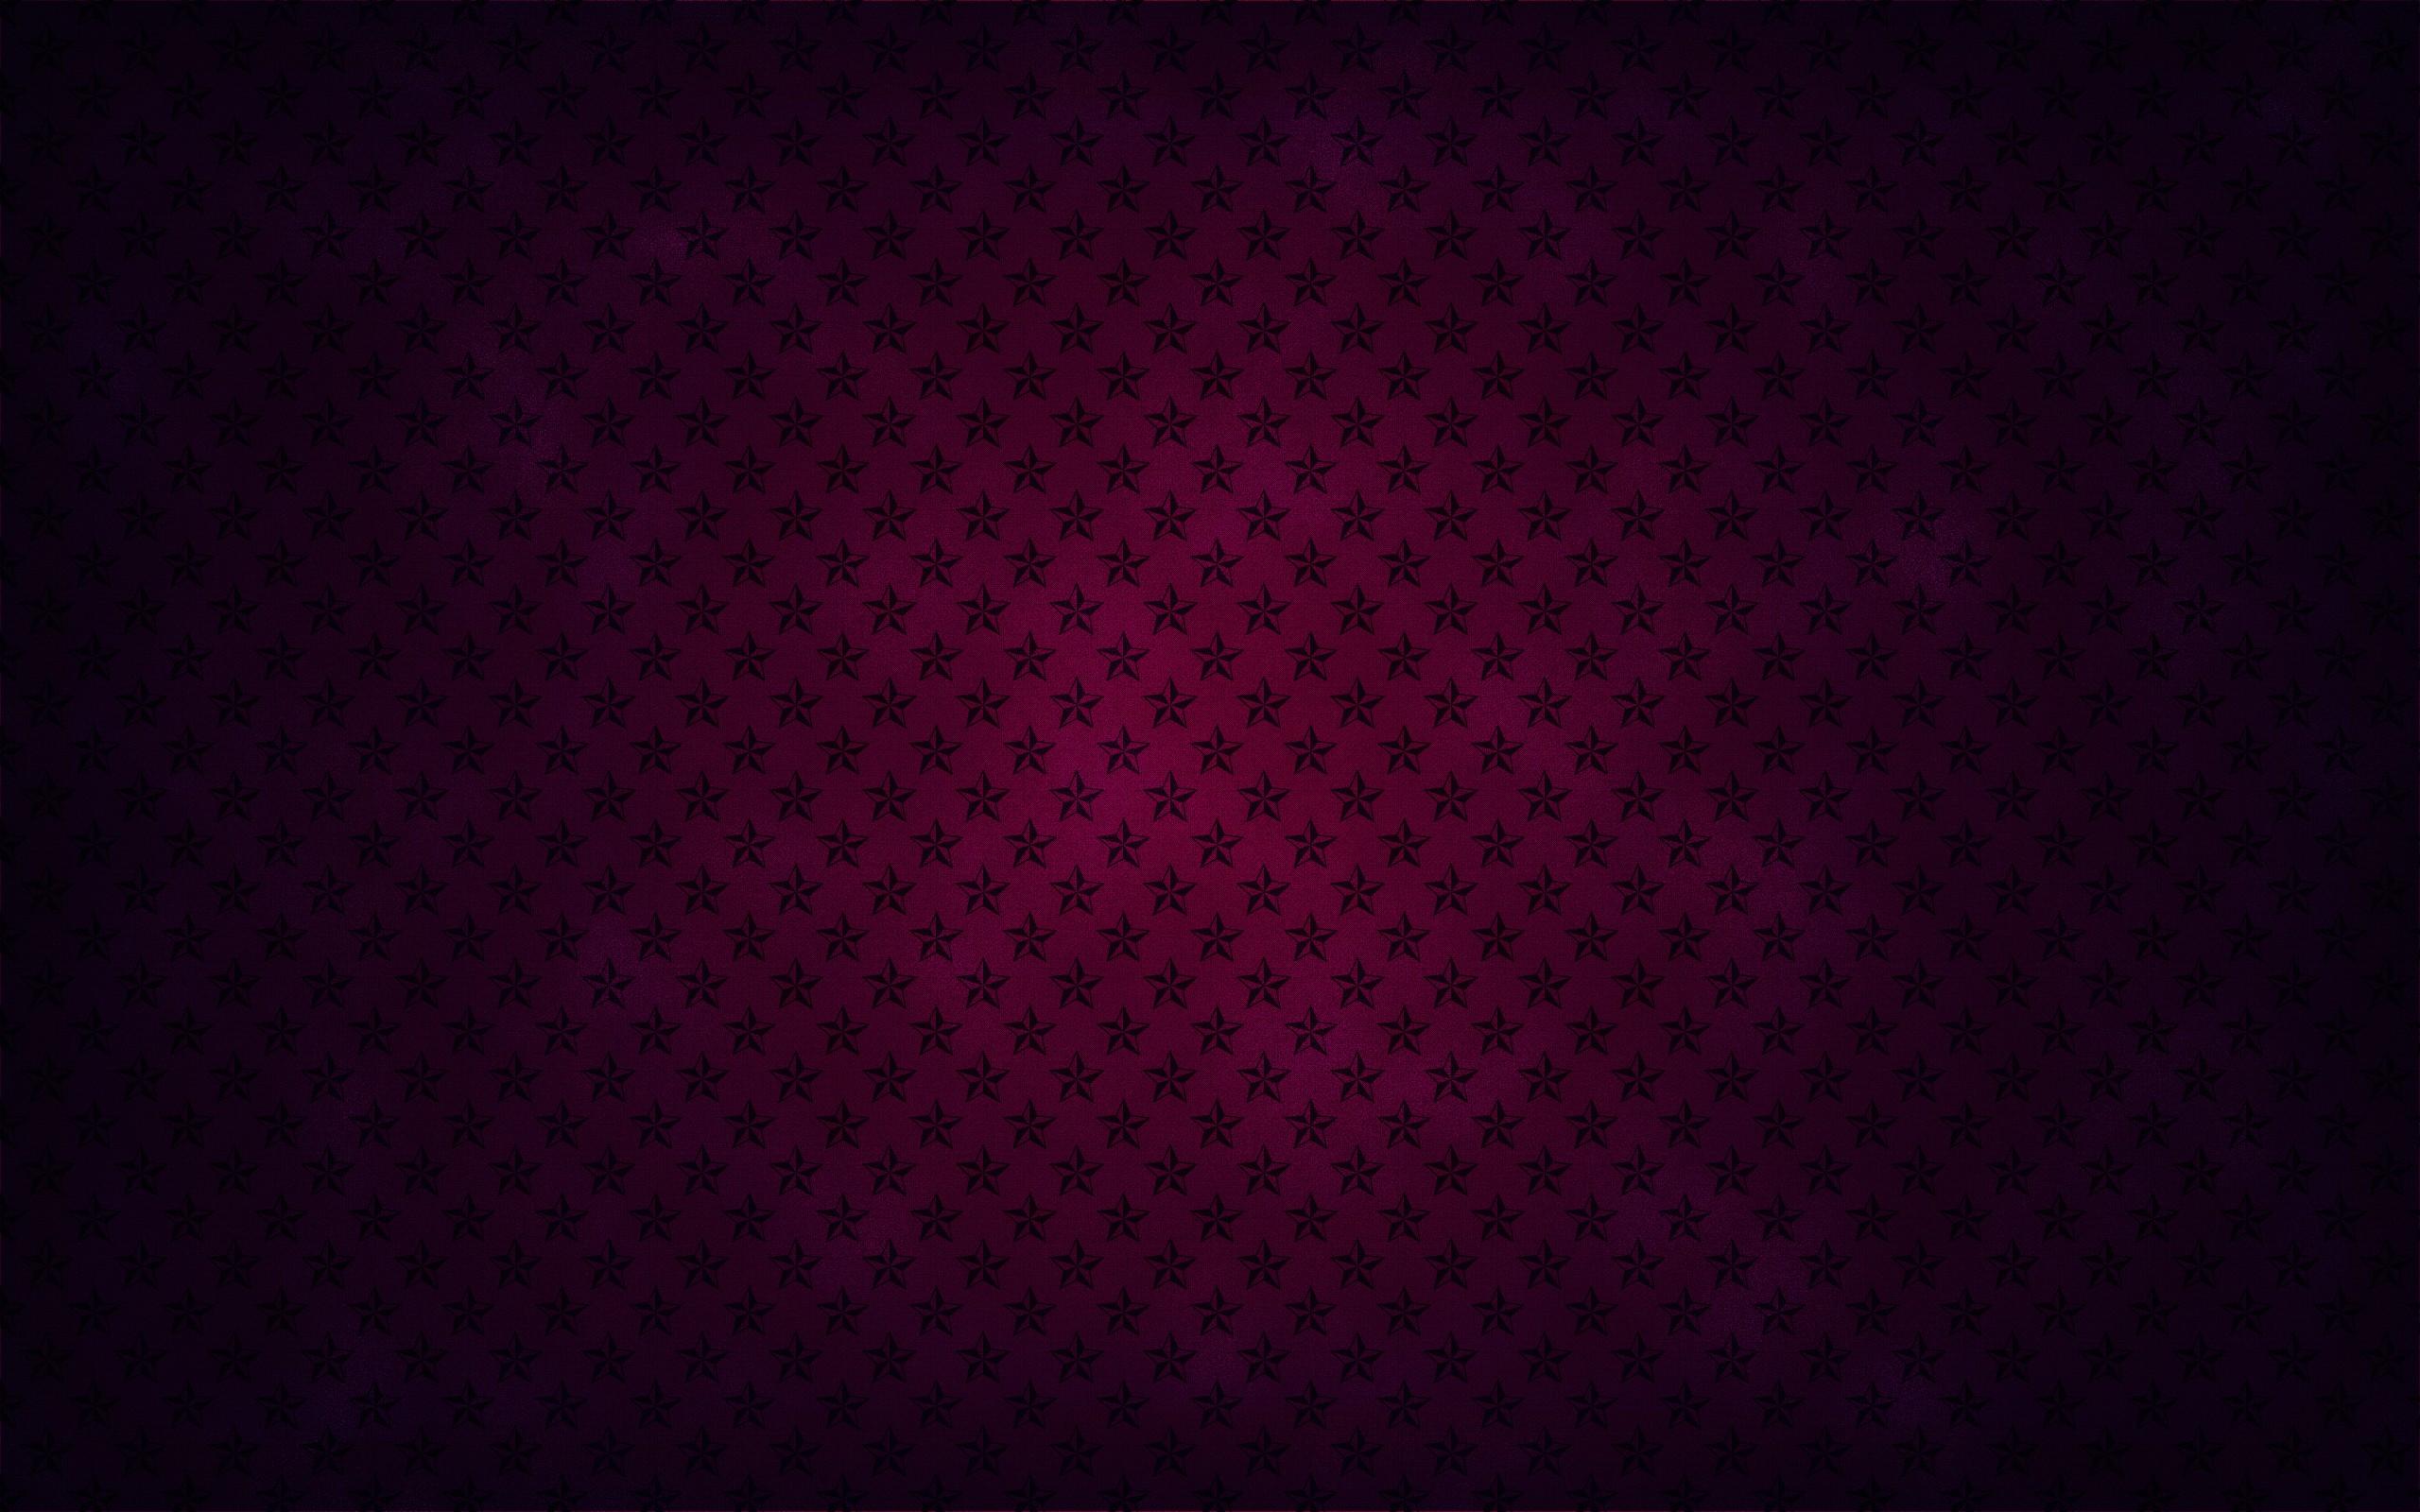 Plain Pink Black Star Background Daily Pics Update HD 2560x1600